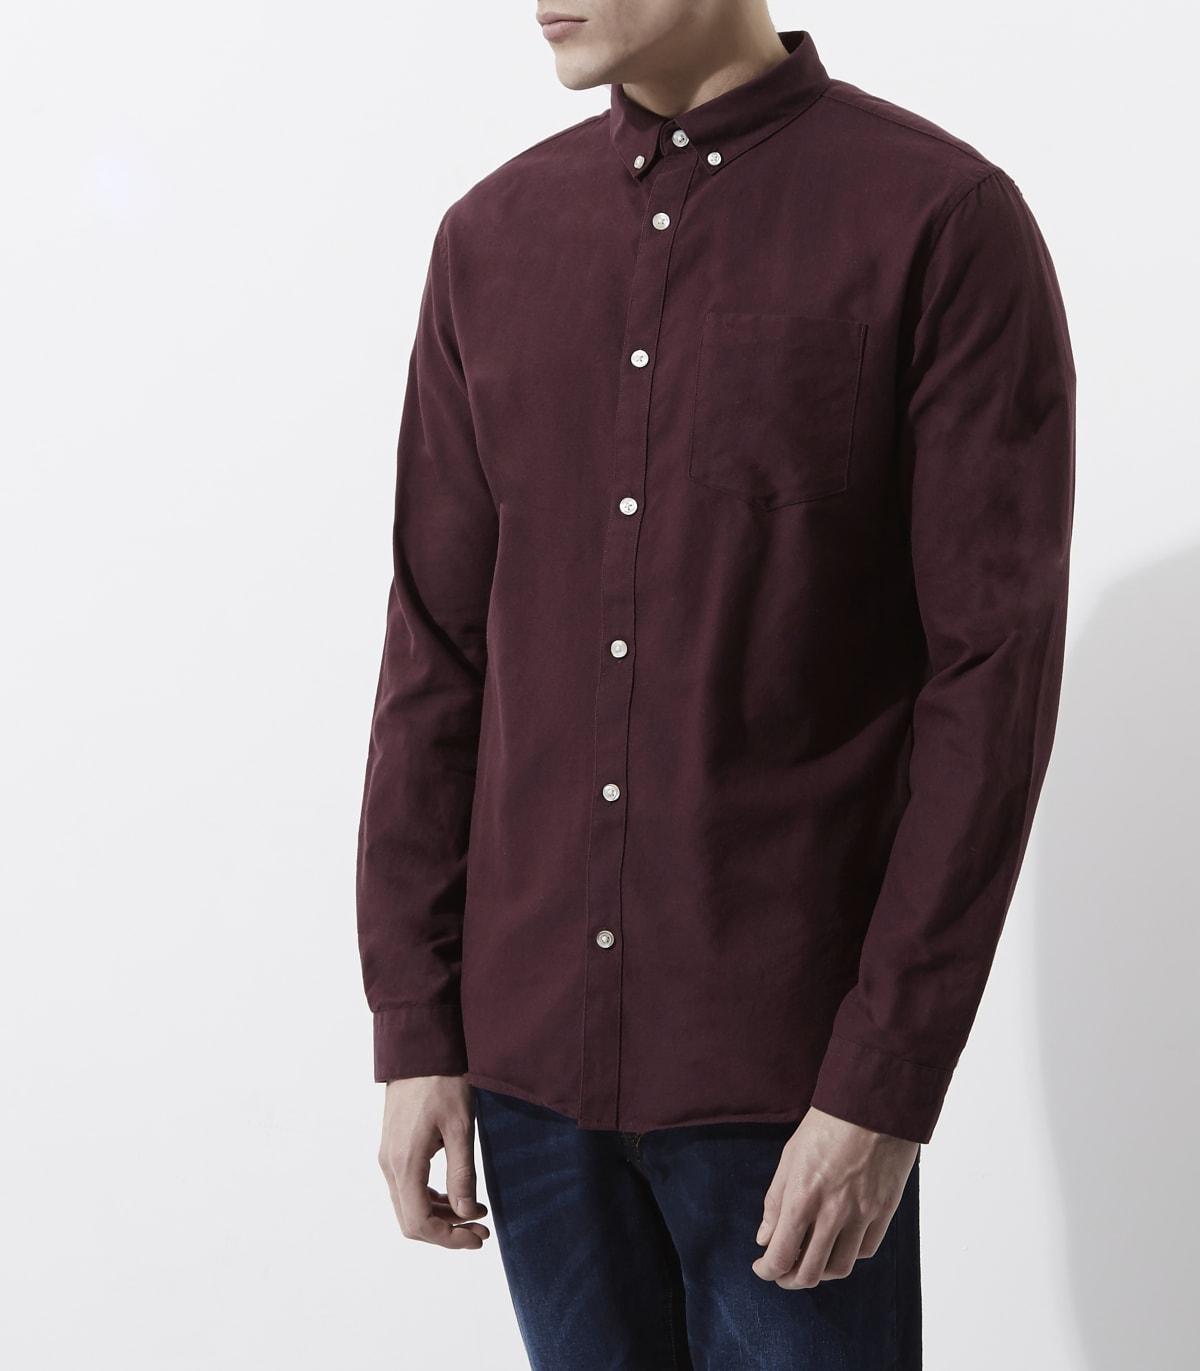 Burgundy long sleeve Oxford shirt